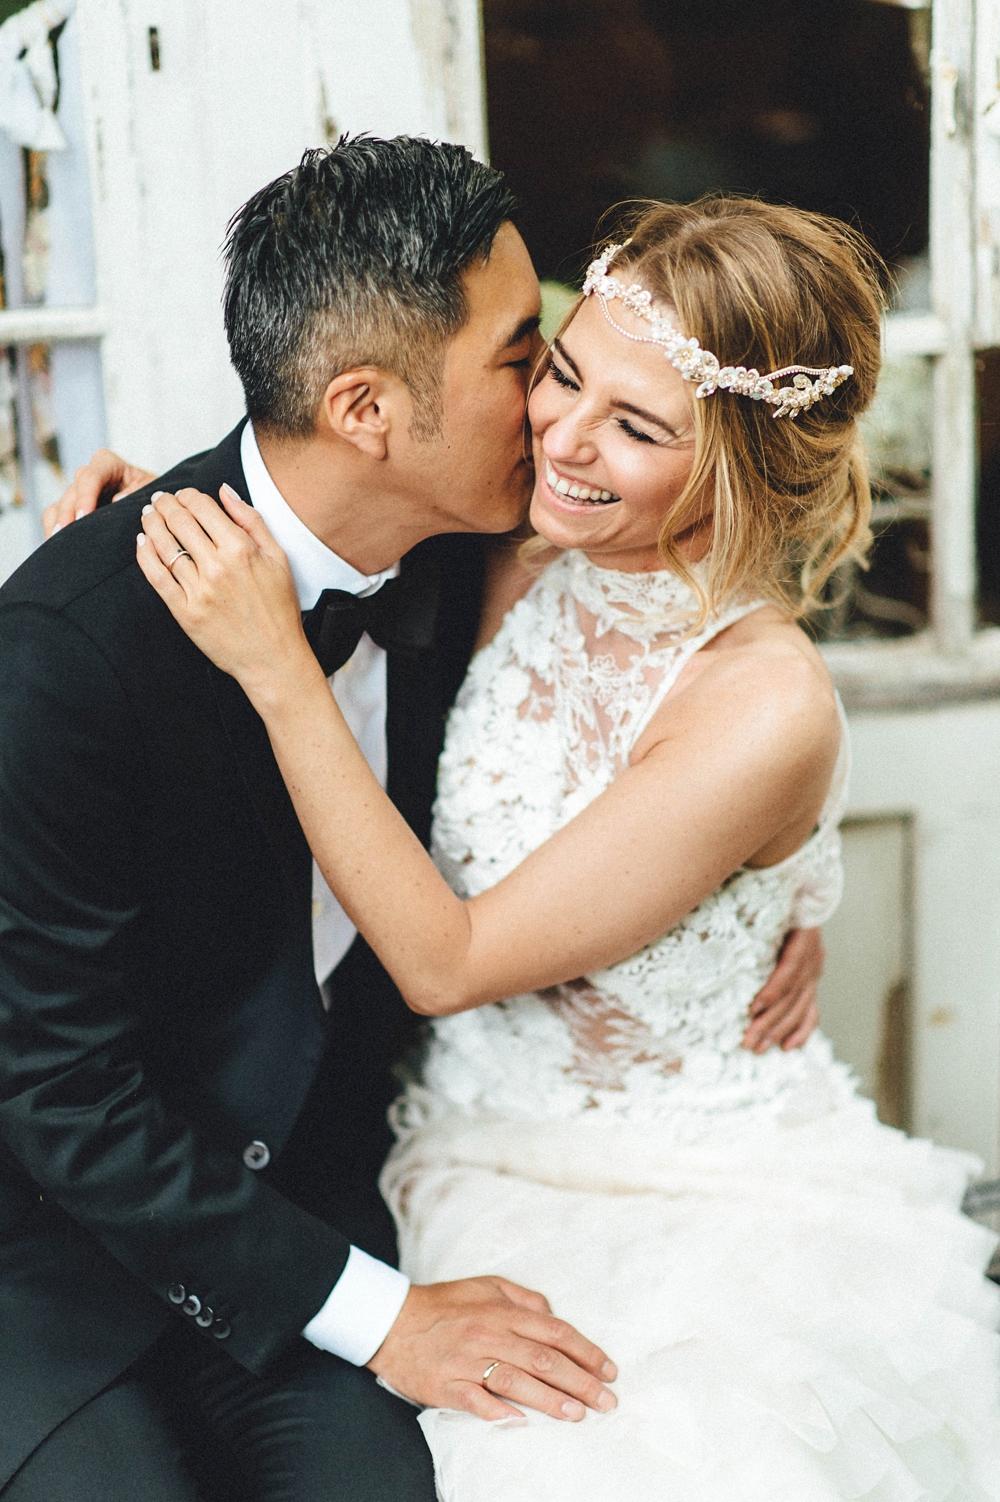 hochzeitsfotograf düsseldorfAnnie & Kazu emotionale Hochzeit in Düsseldorfbohemian emotional wedding nrw 1394